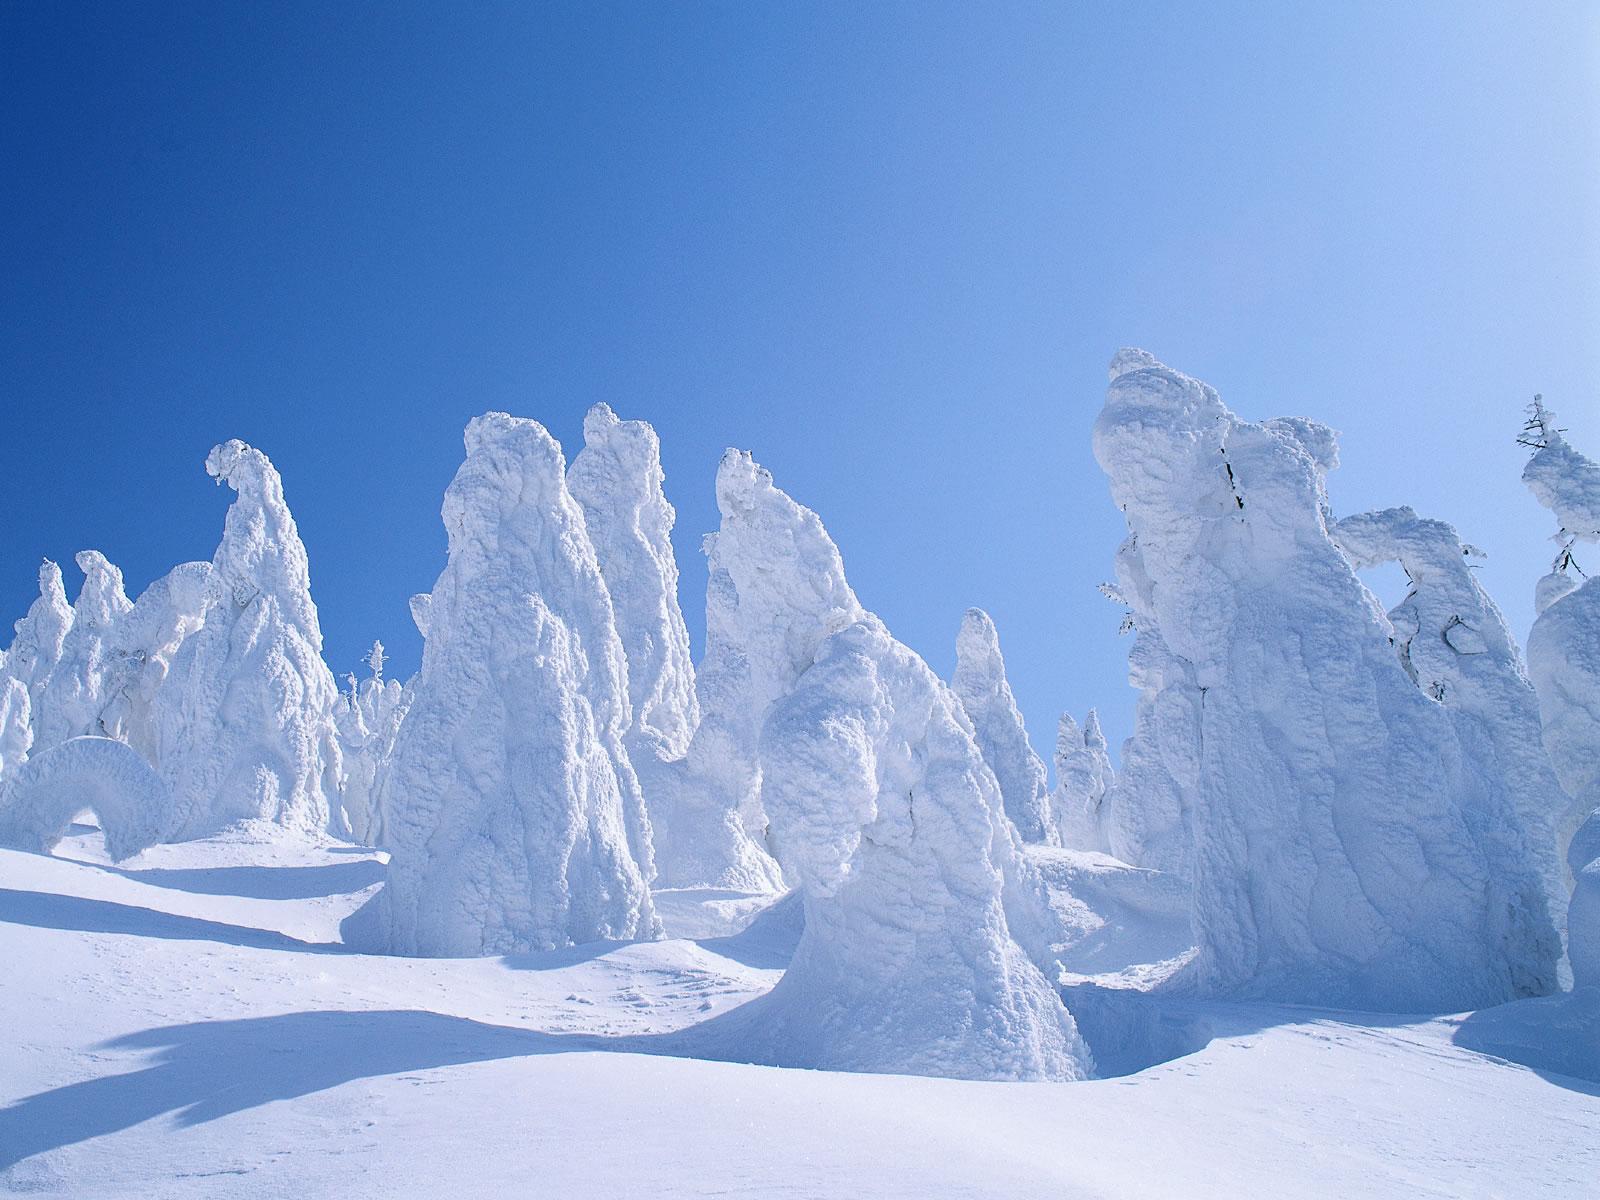 desktop falling snow backgrounds for desktop Desktop Backgrounds 1600x1200